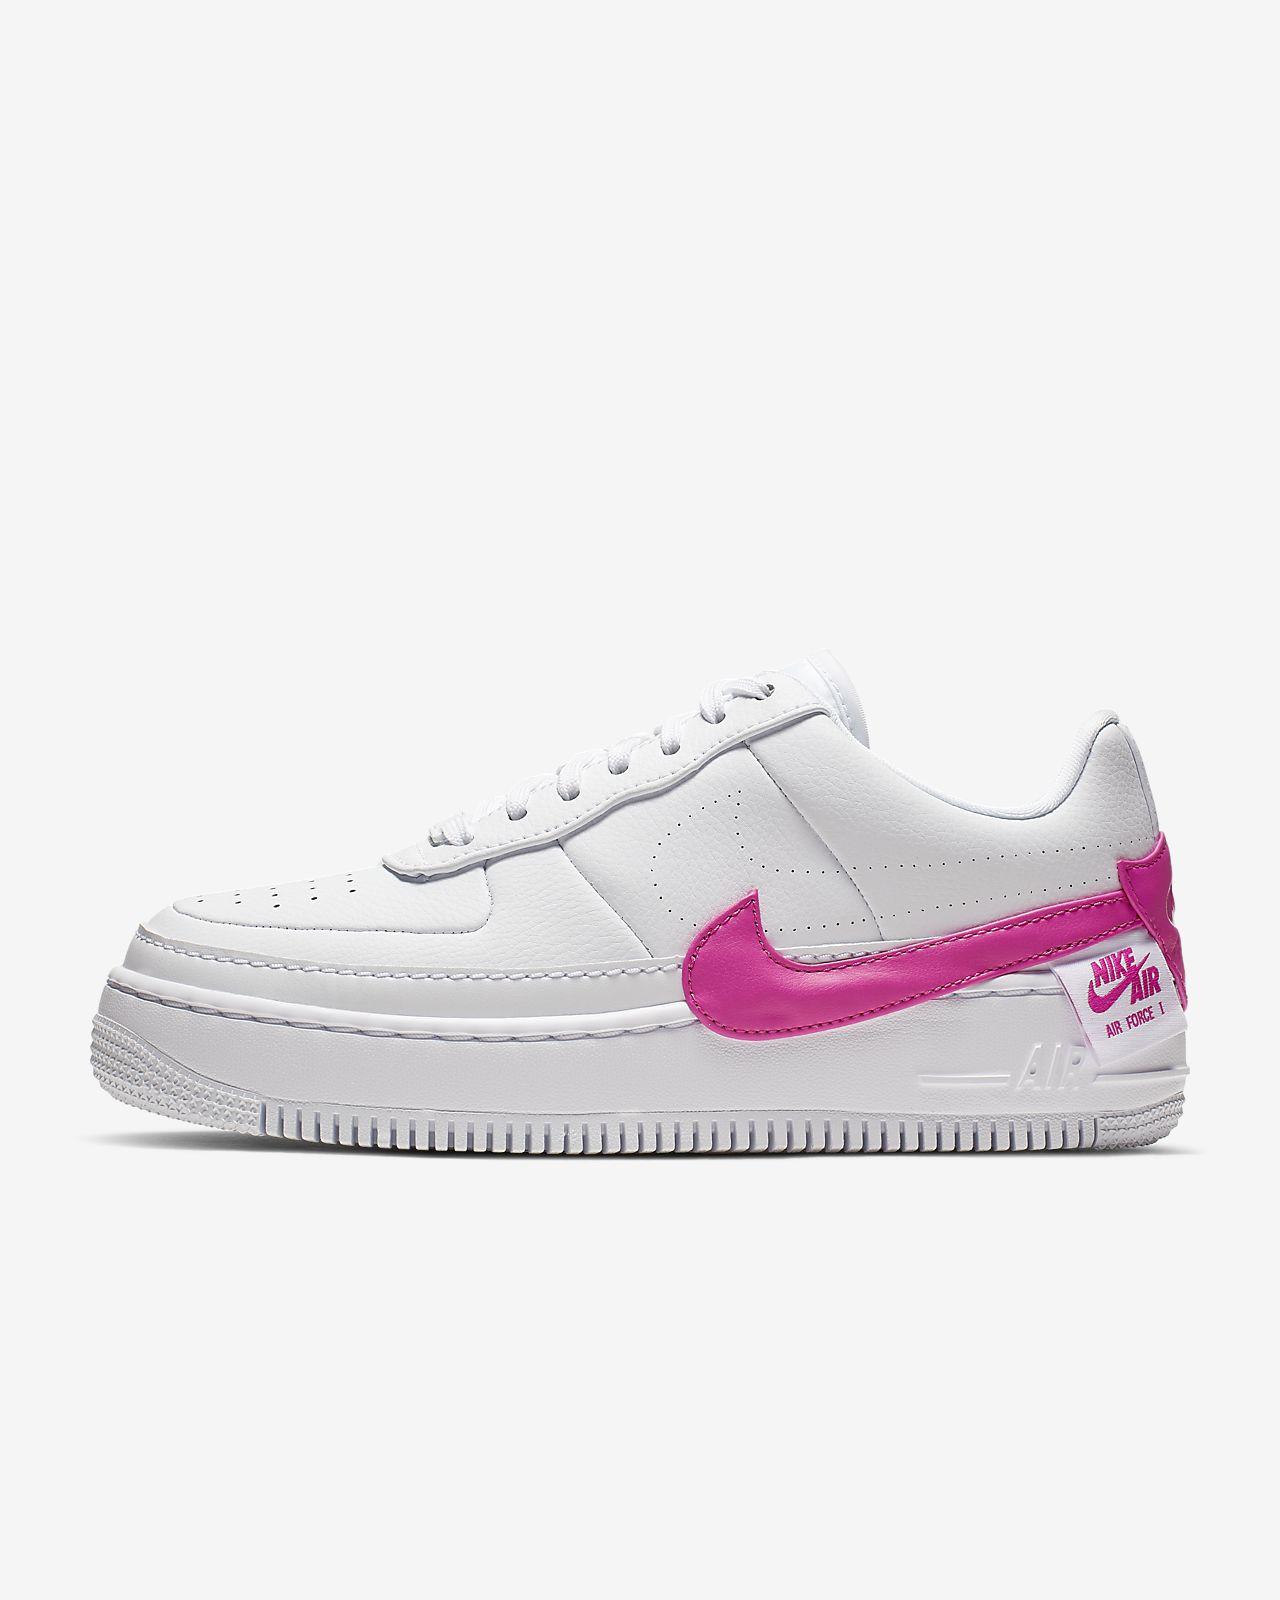 8c8999cef419 Nike Air Force 1 Jester XX cipő. Nike.com HU